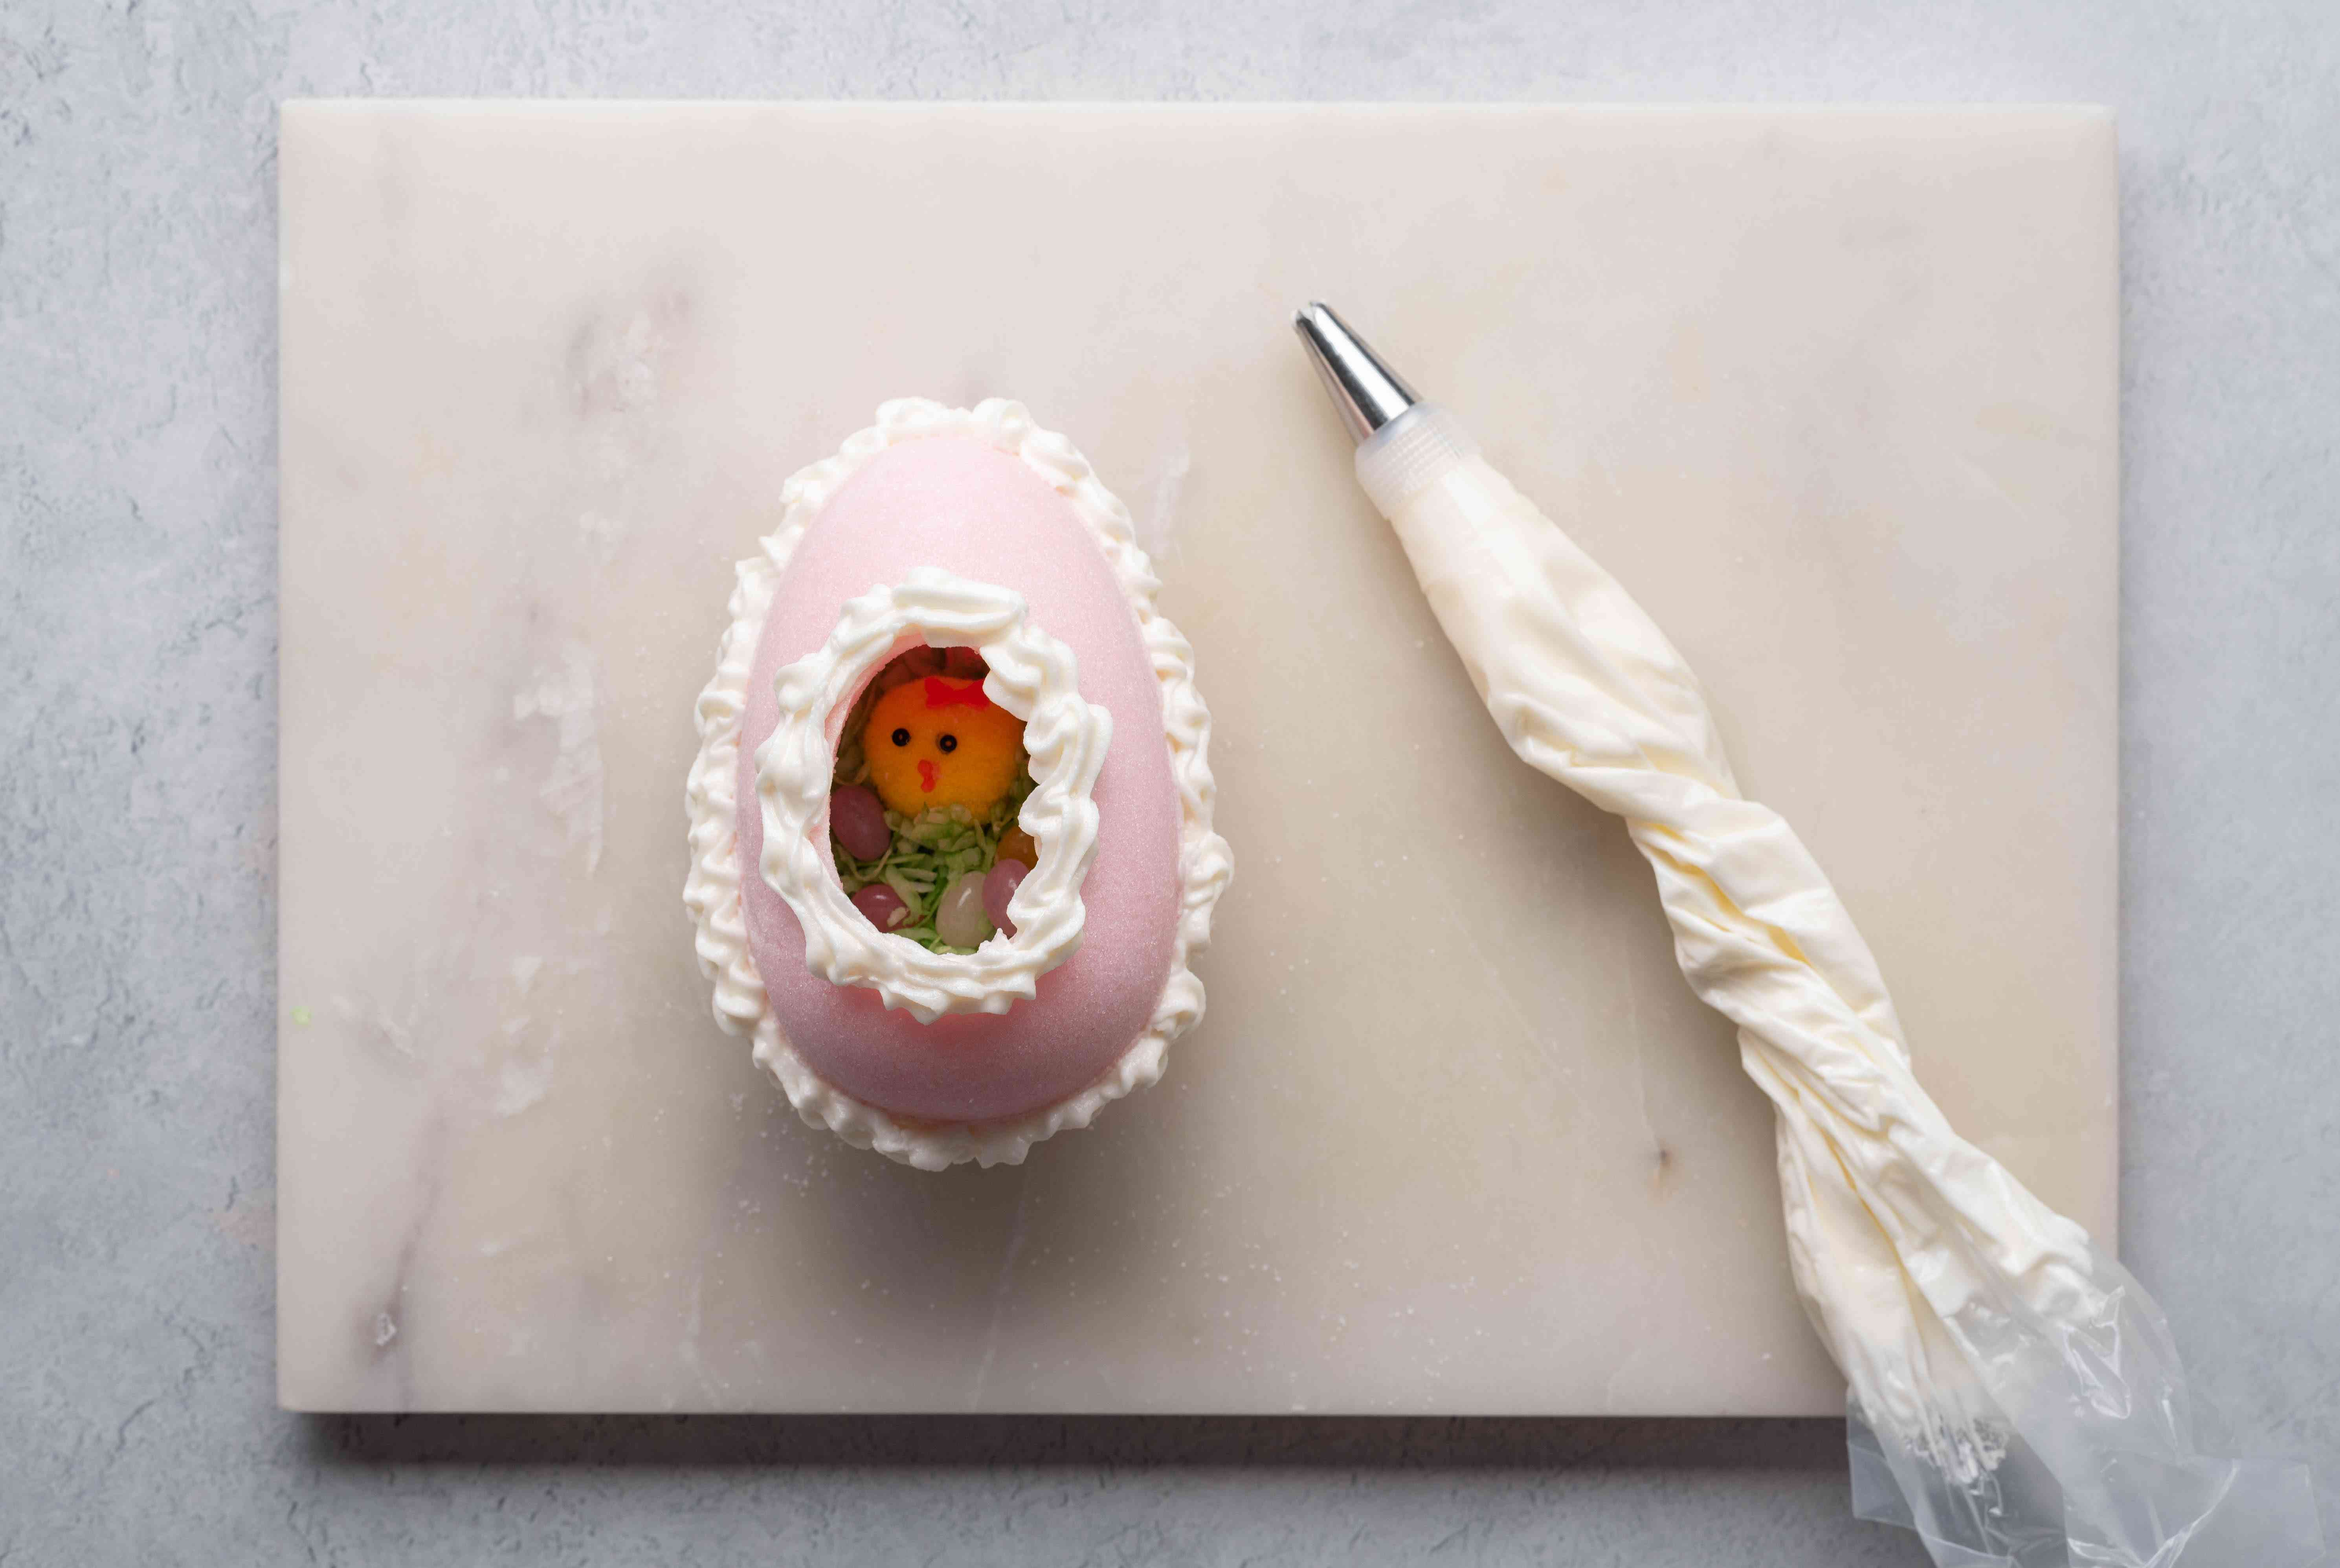 decorative icing borders around sugar egg